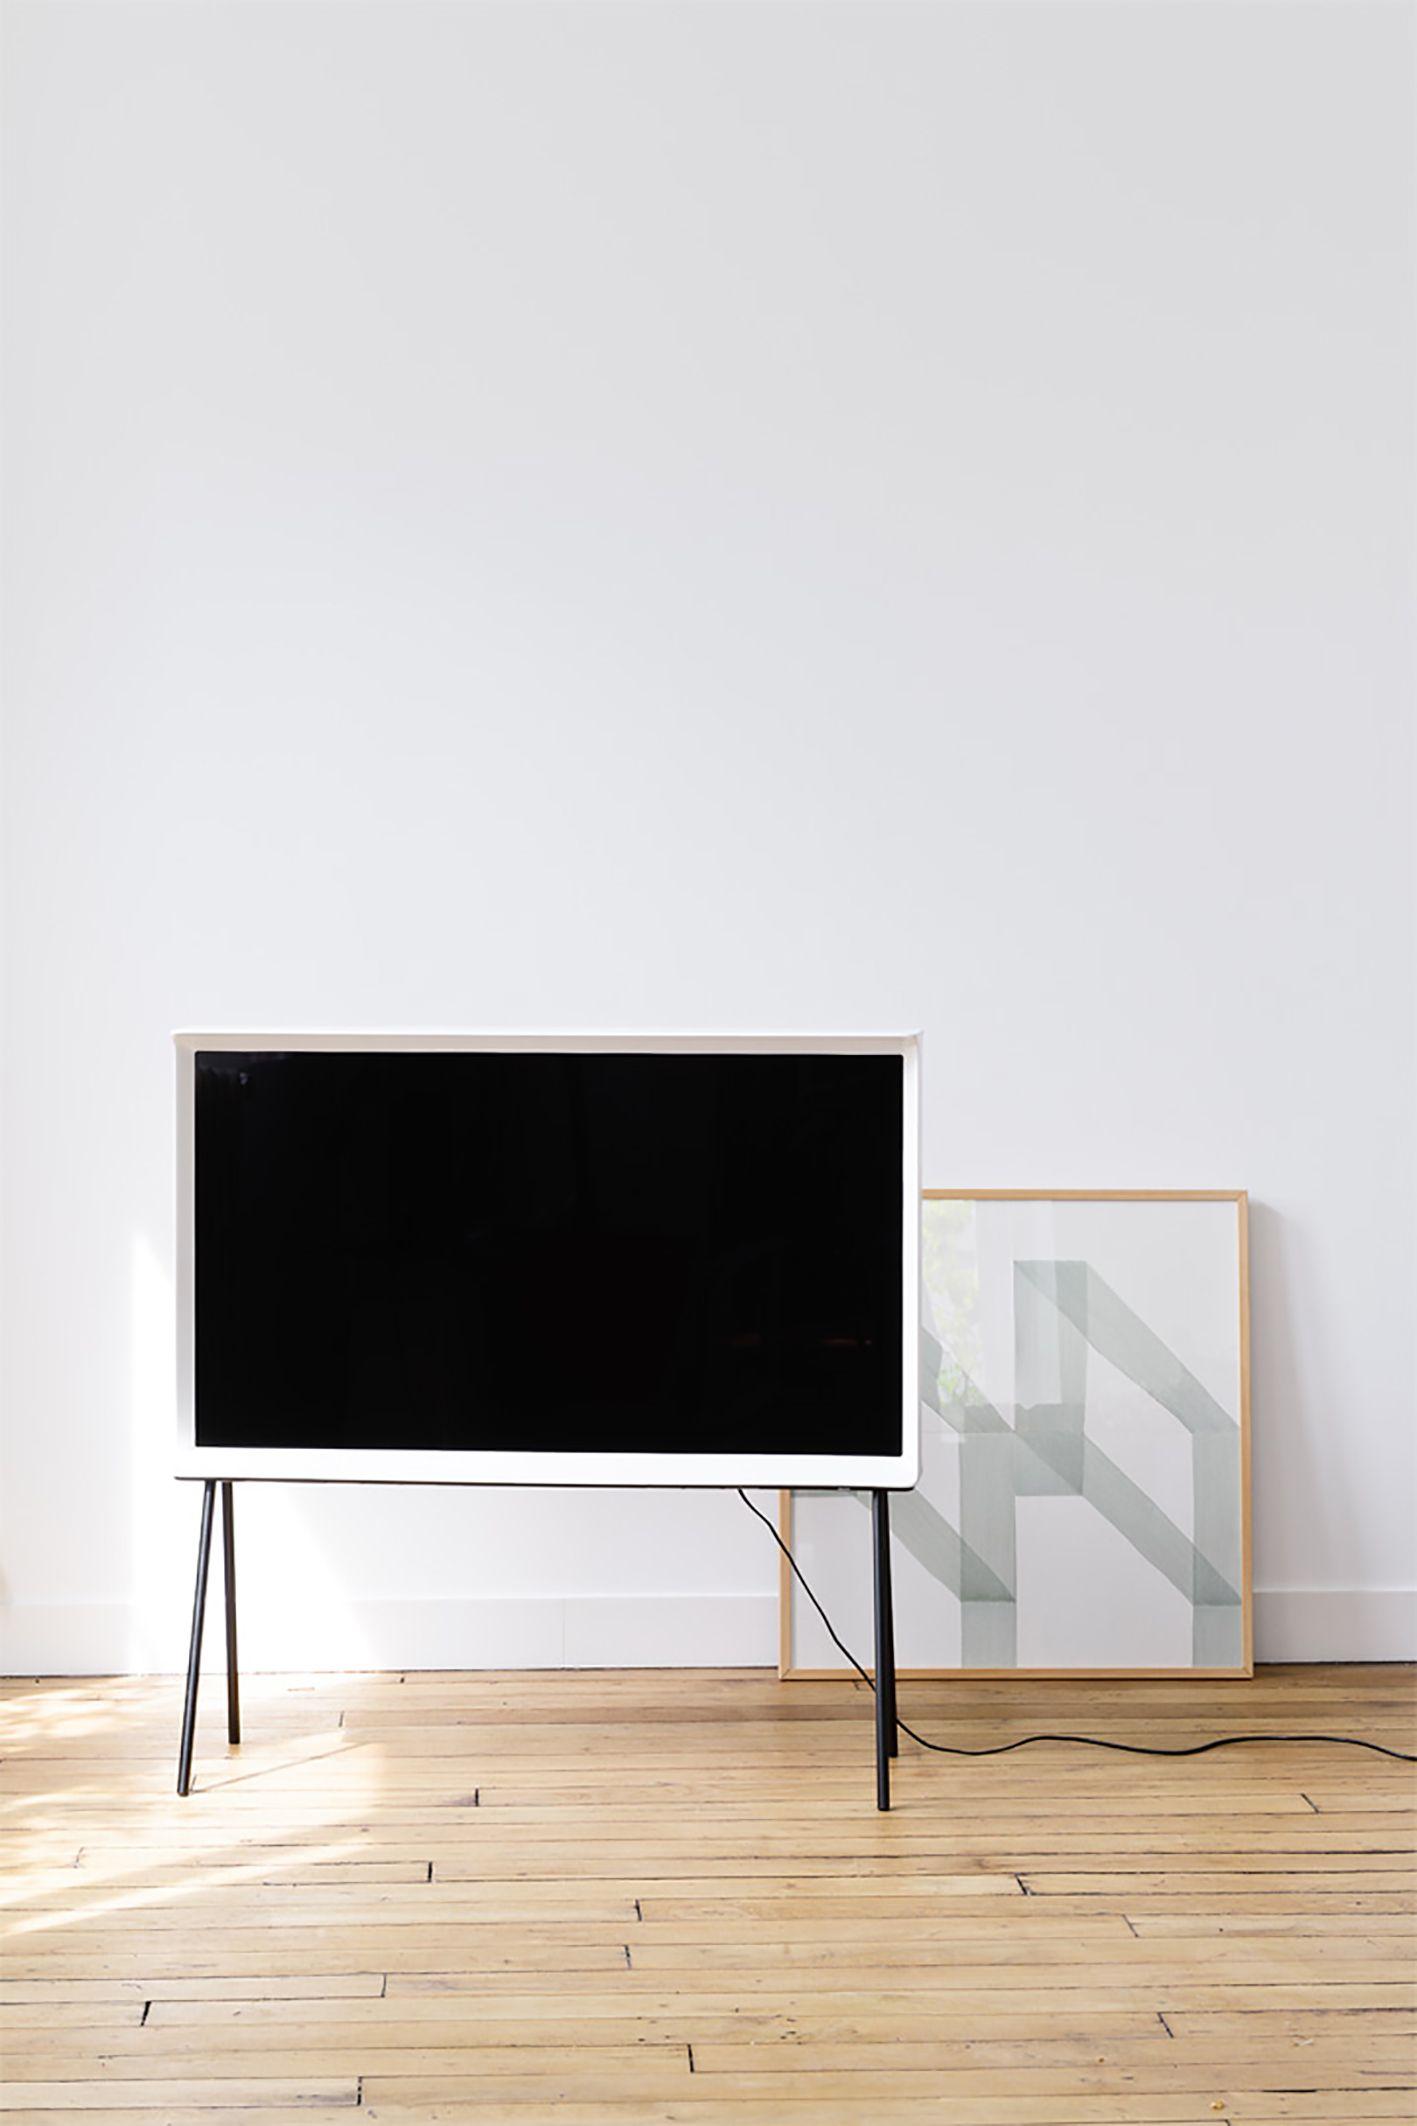 Samsung Serif Tv Home Goods Pinterest Serif And Tech # Meuble Tv Designer